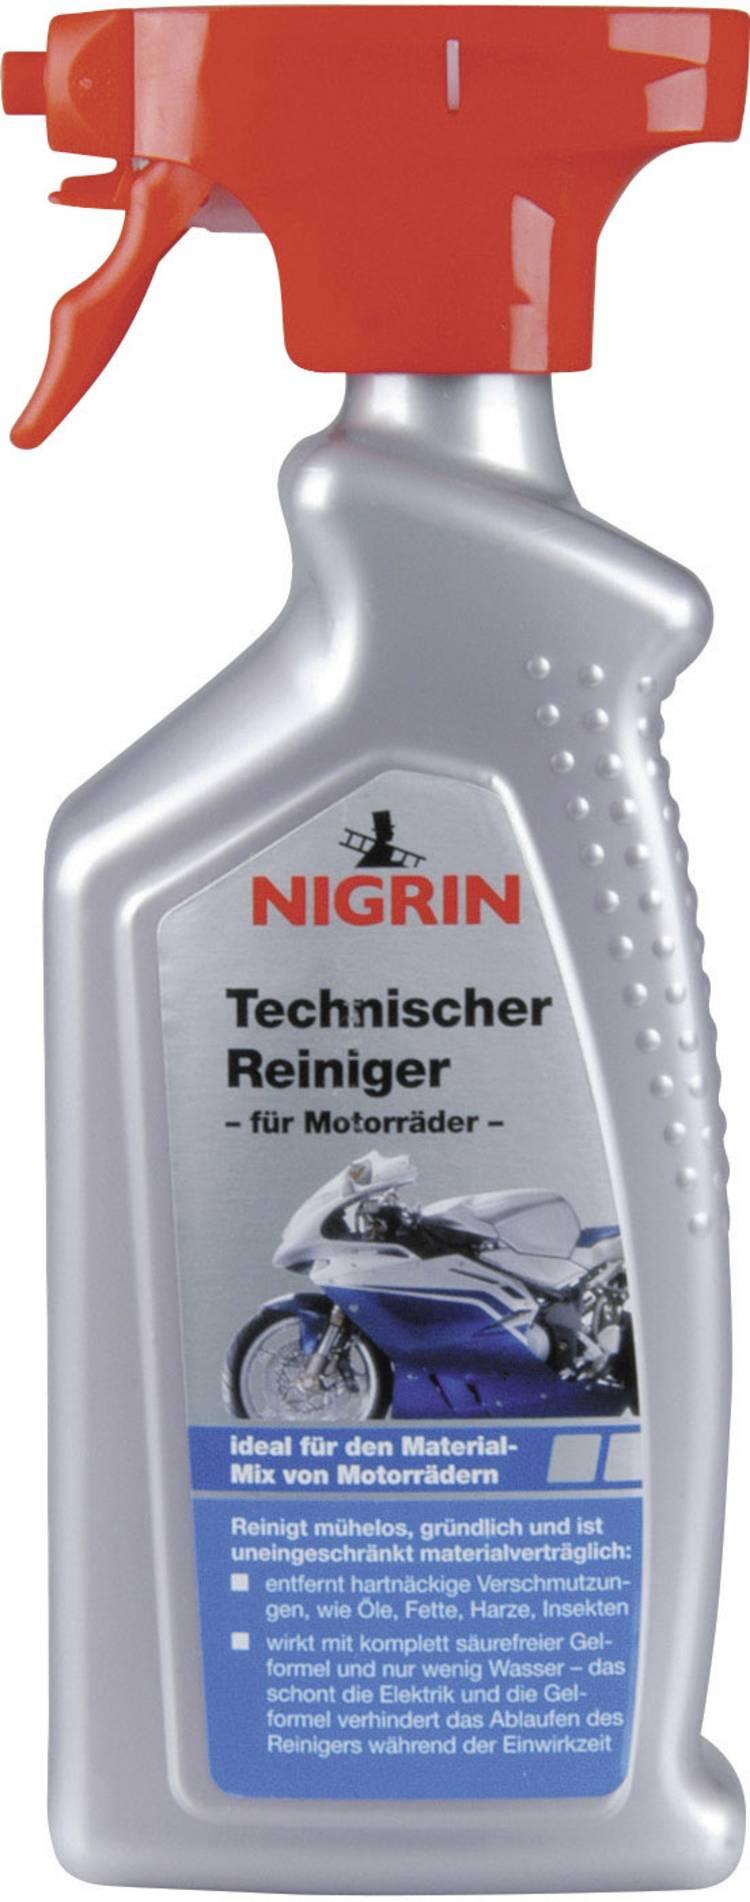 Image of Nigrin 74120 500 ml